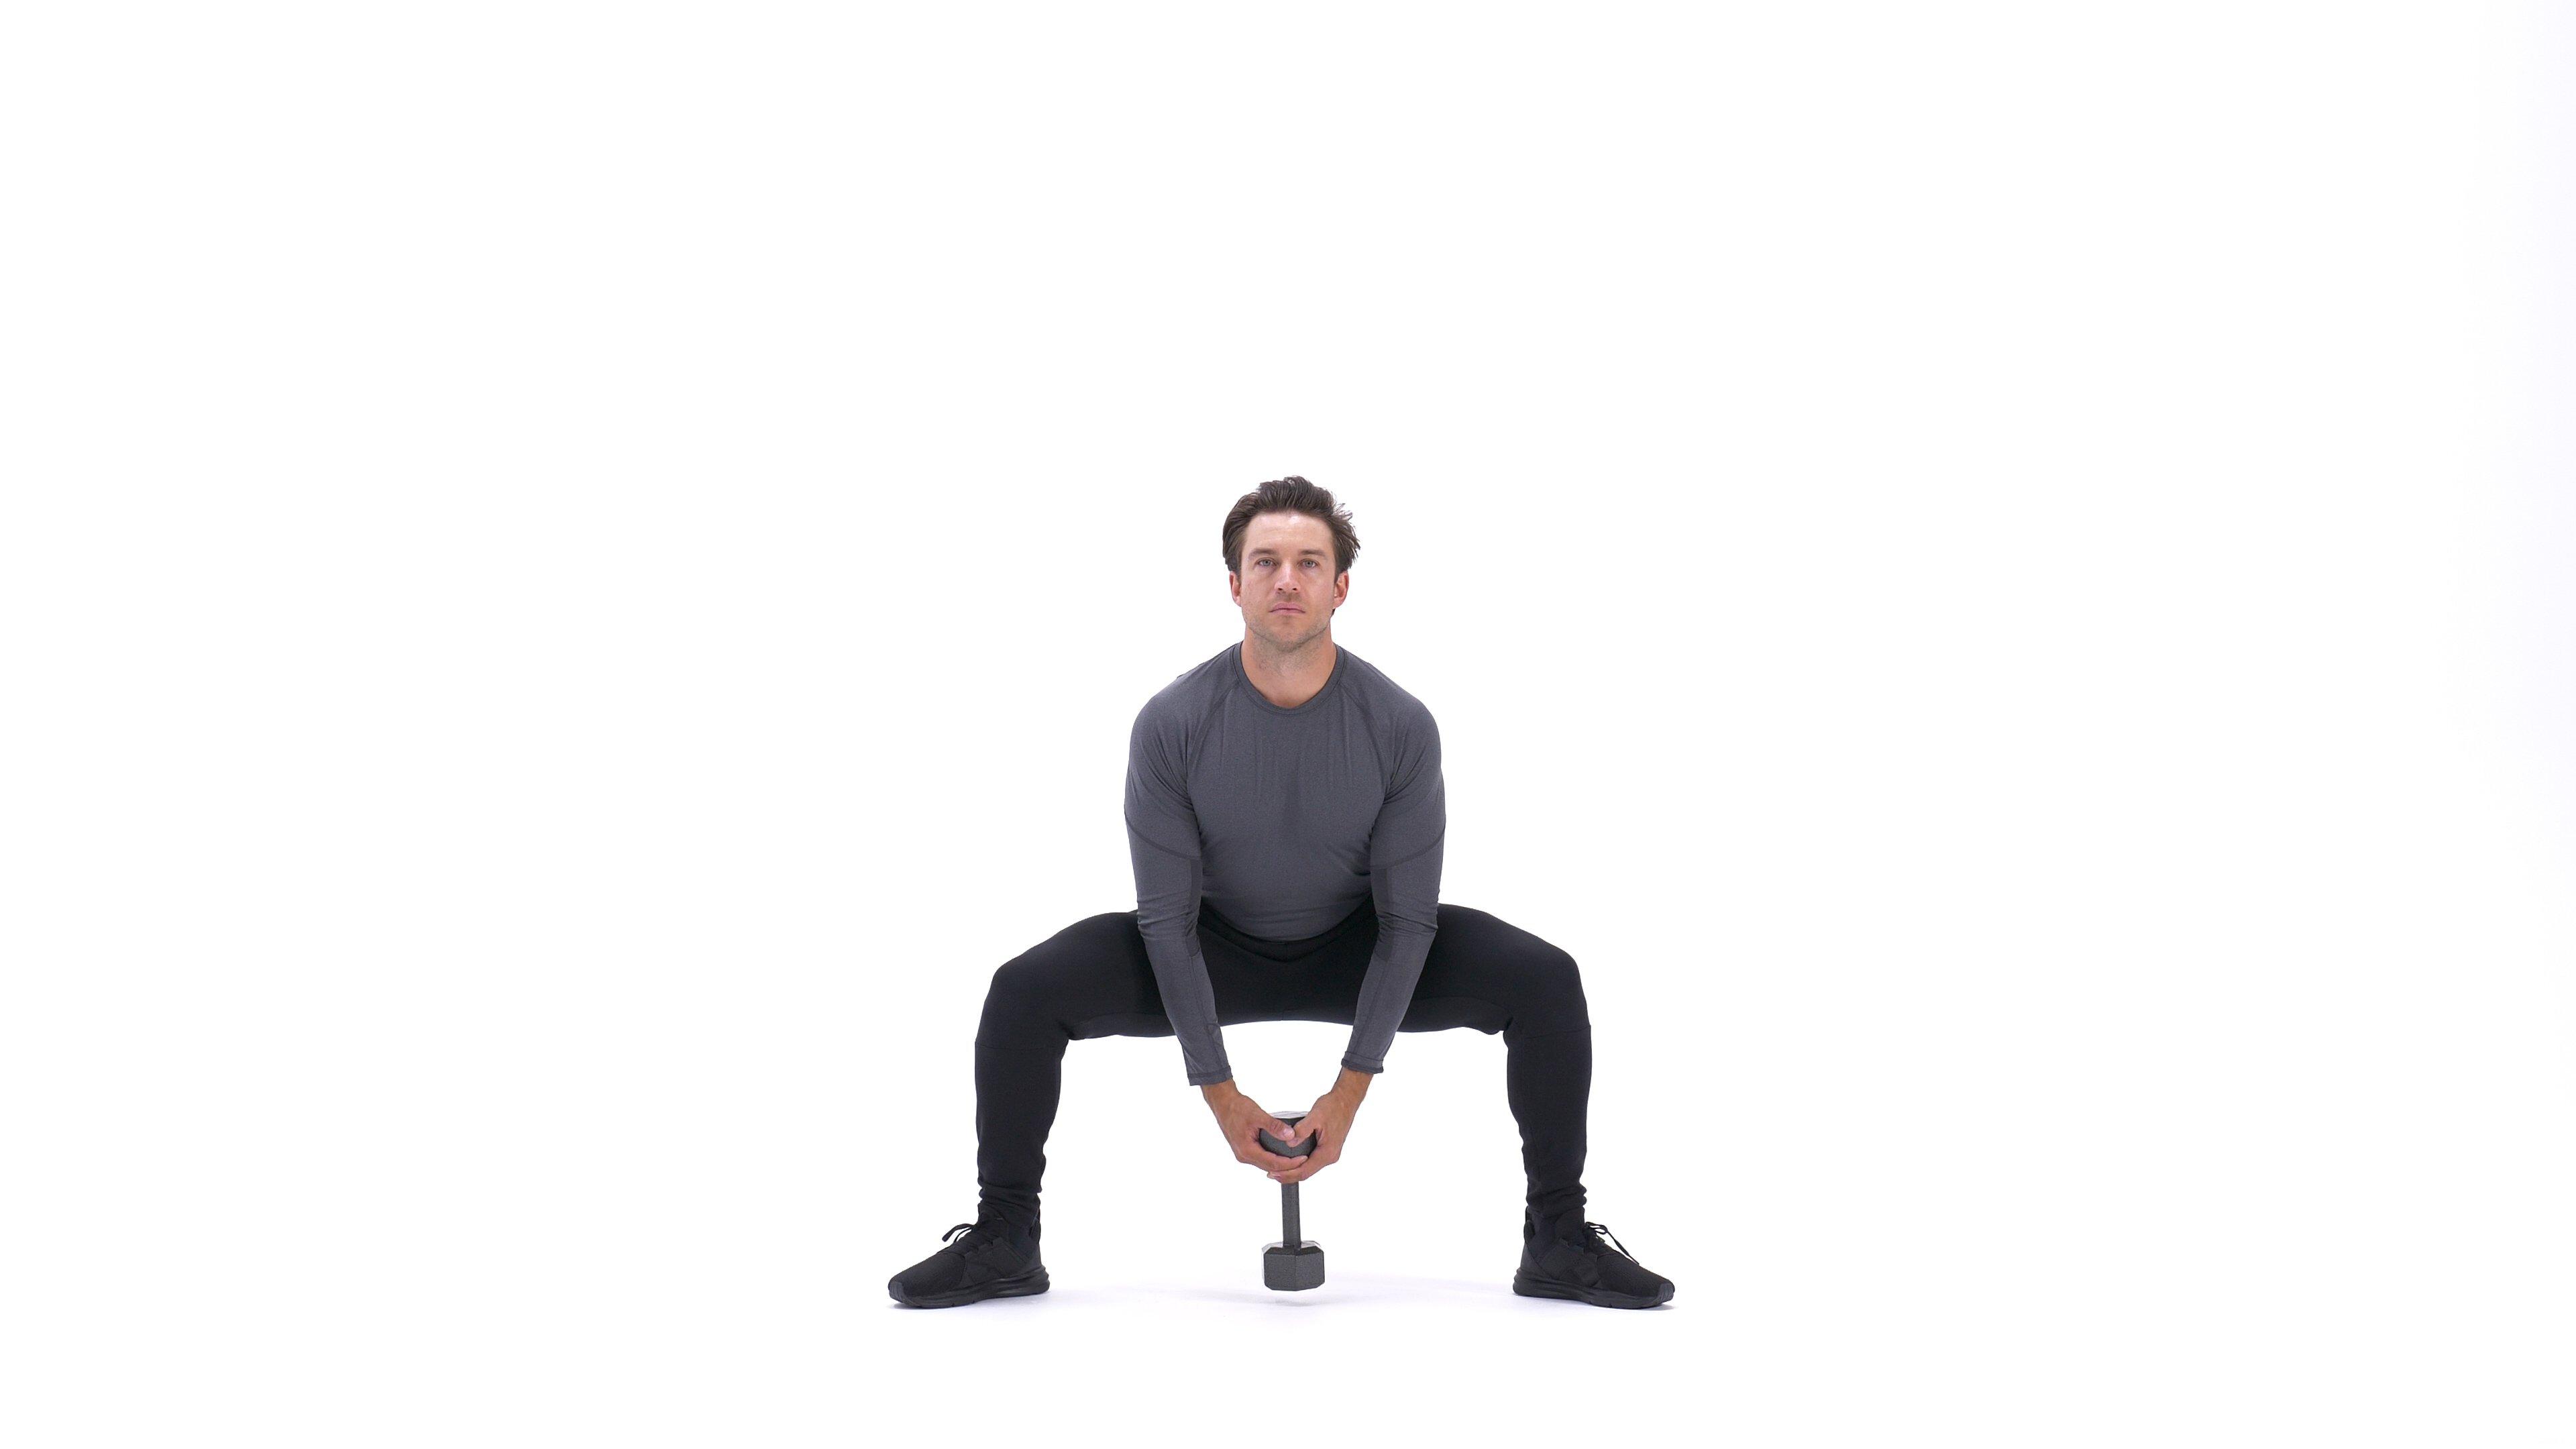 Dumbbell sumo squat image